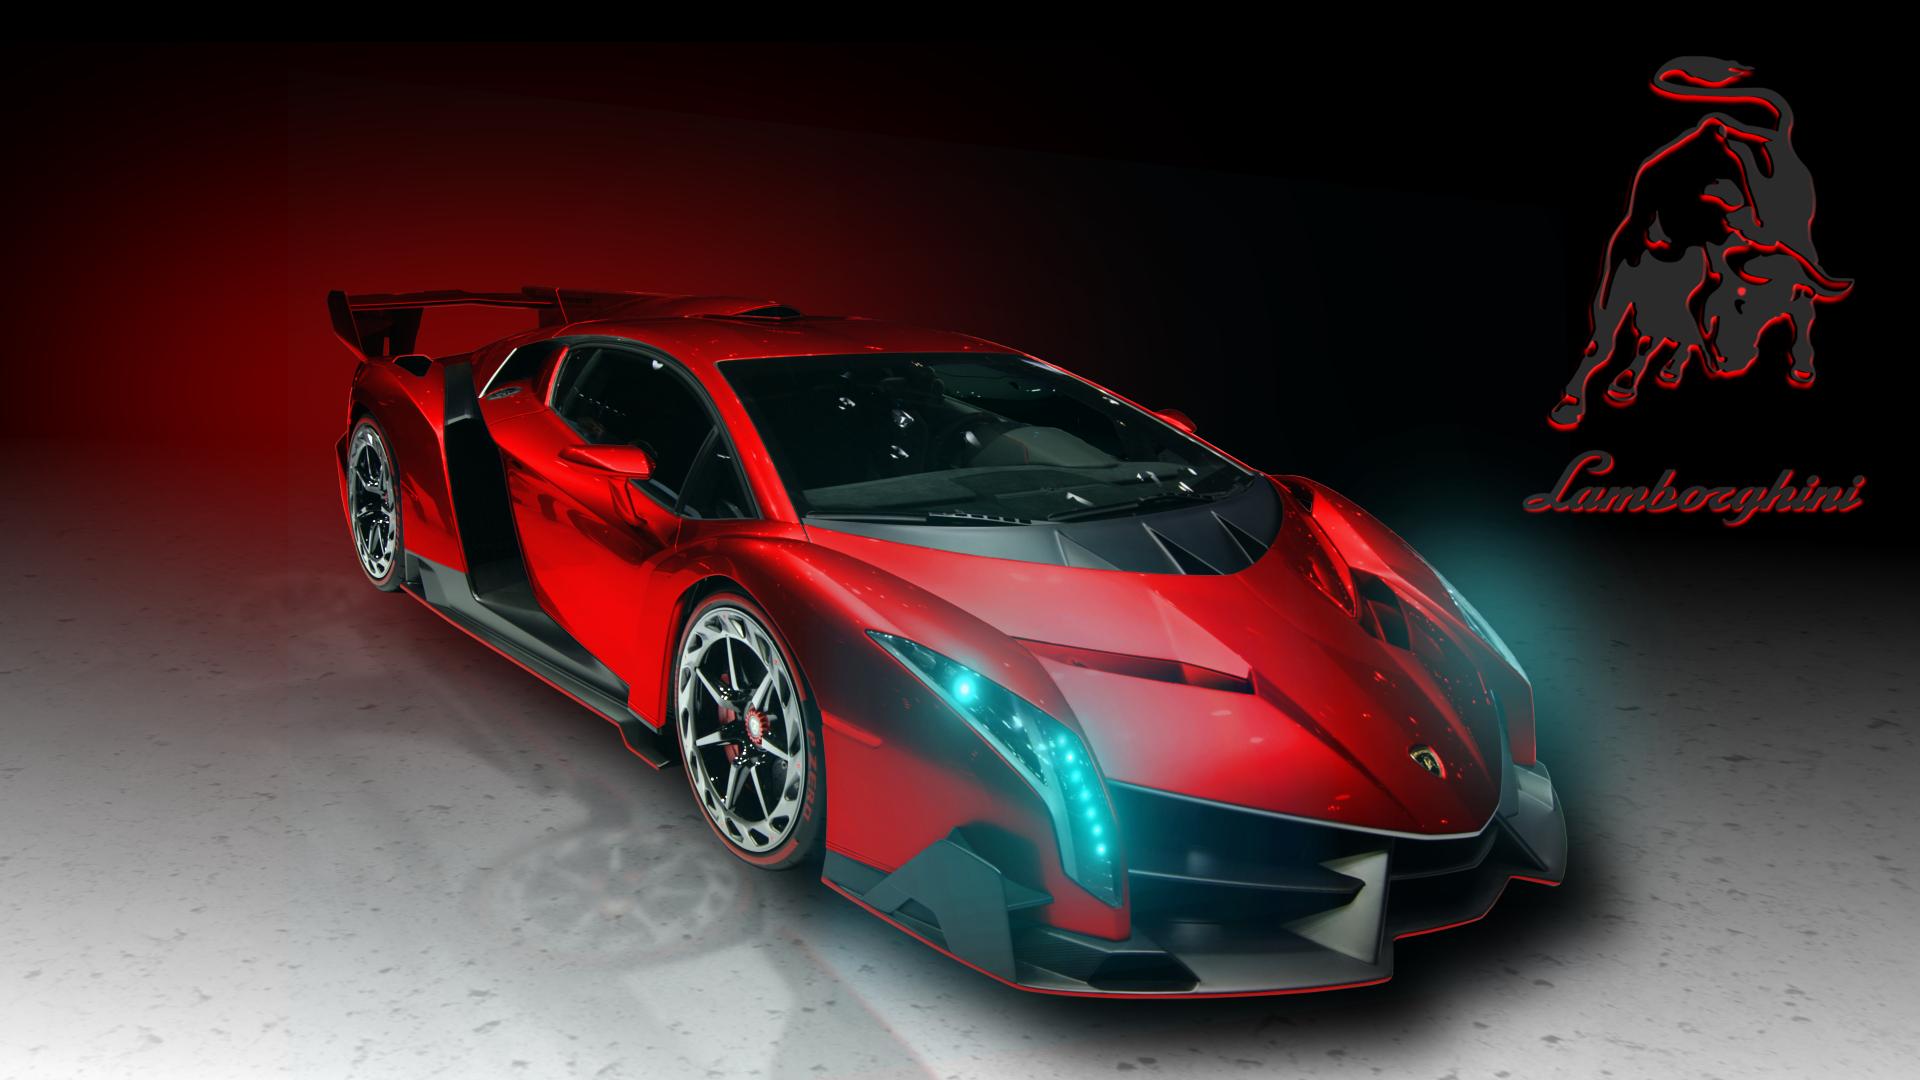 Hd Lamborghini Wallpaper Wallpapersafari